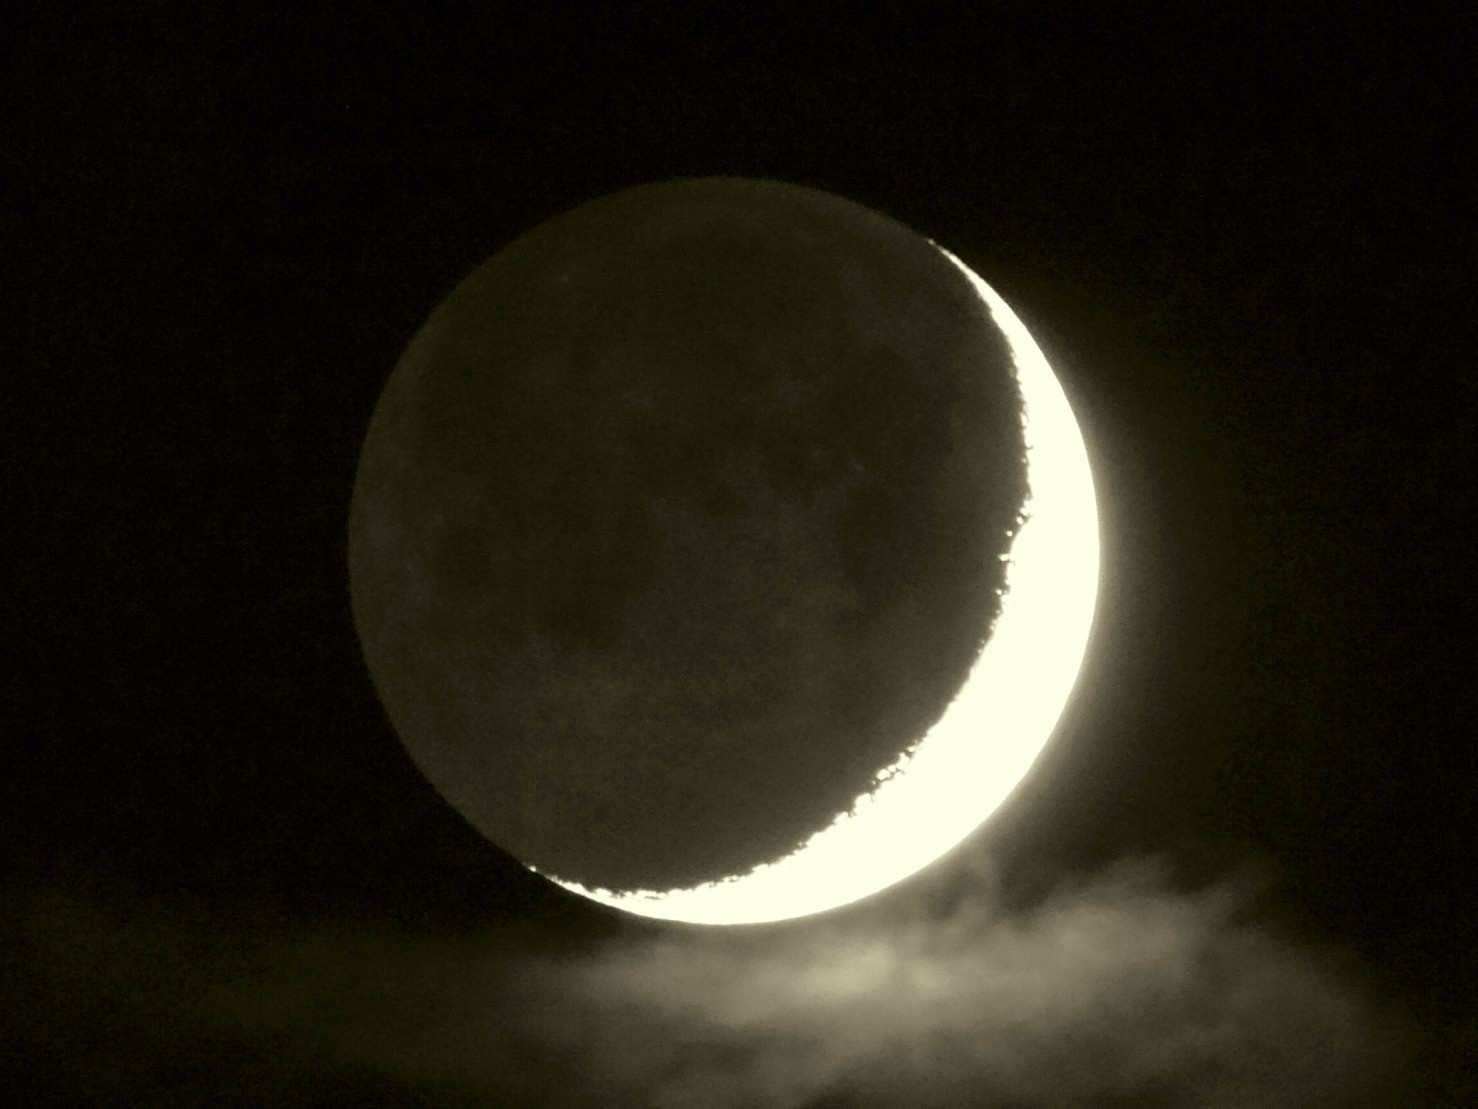 Moon lit by earthshine